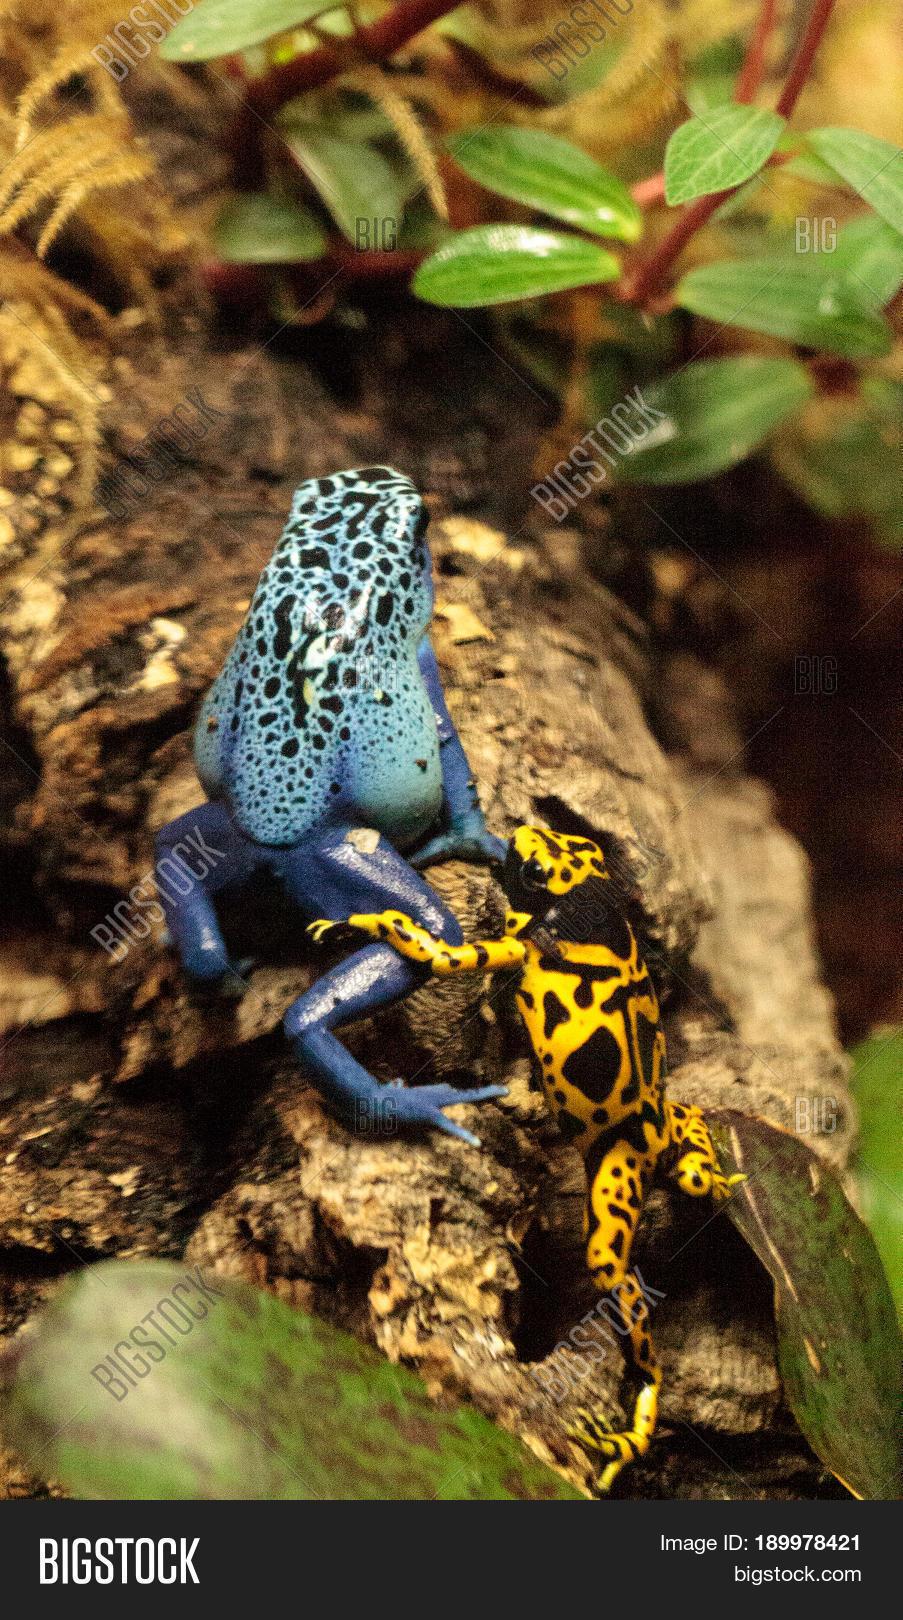 Blue Poison Dart Frog Image Photo Free Trial Bigstock